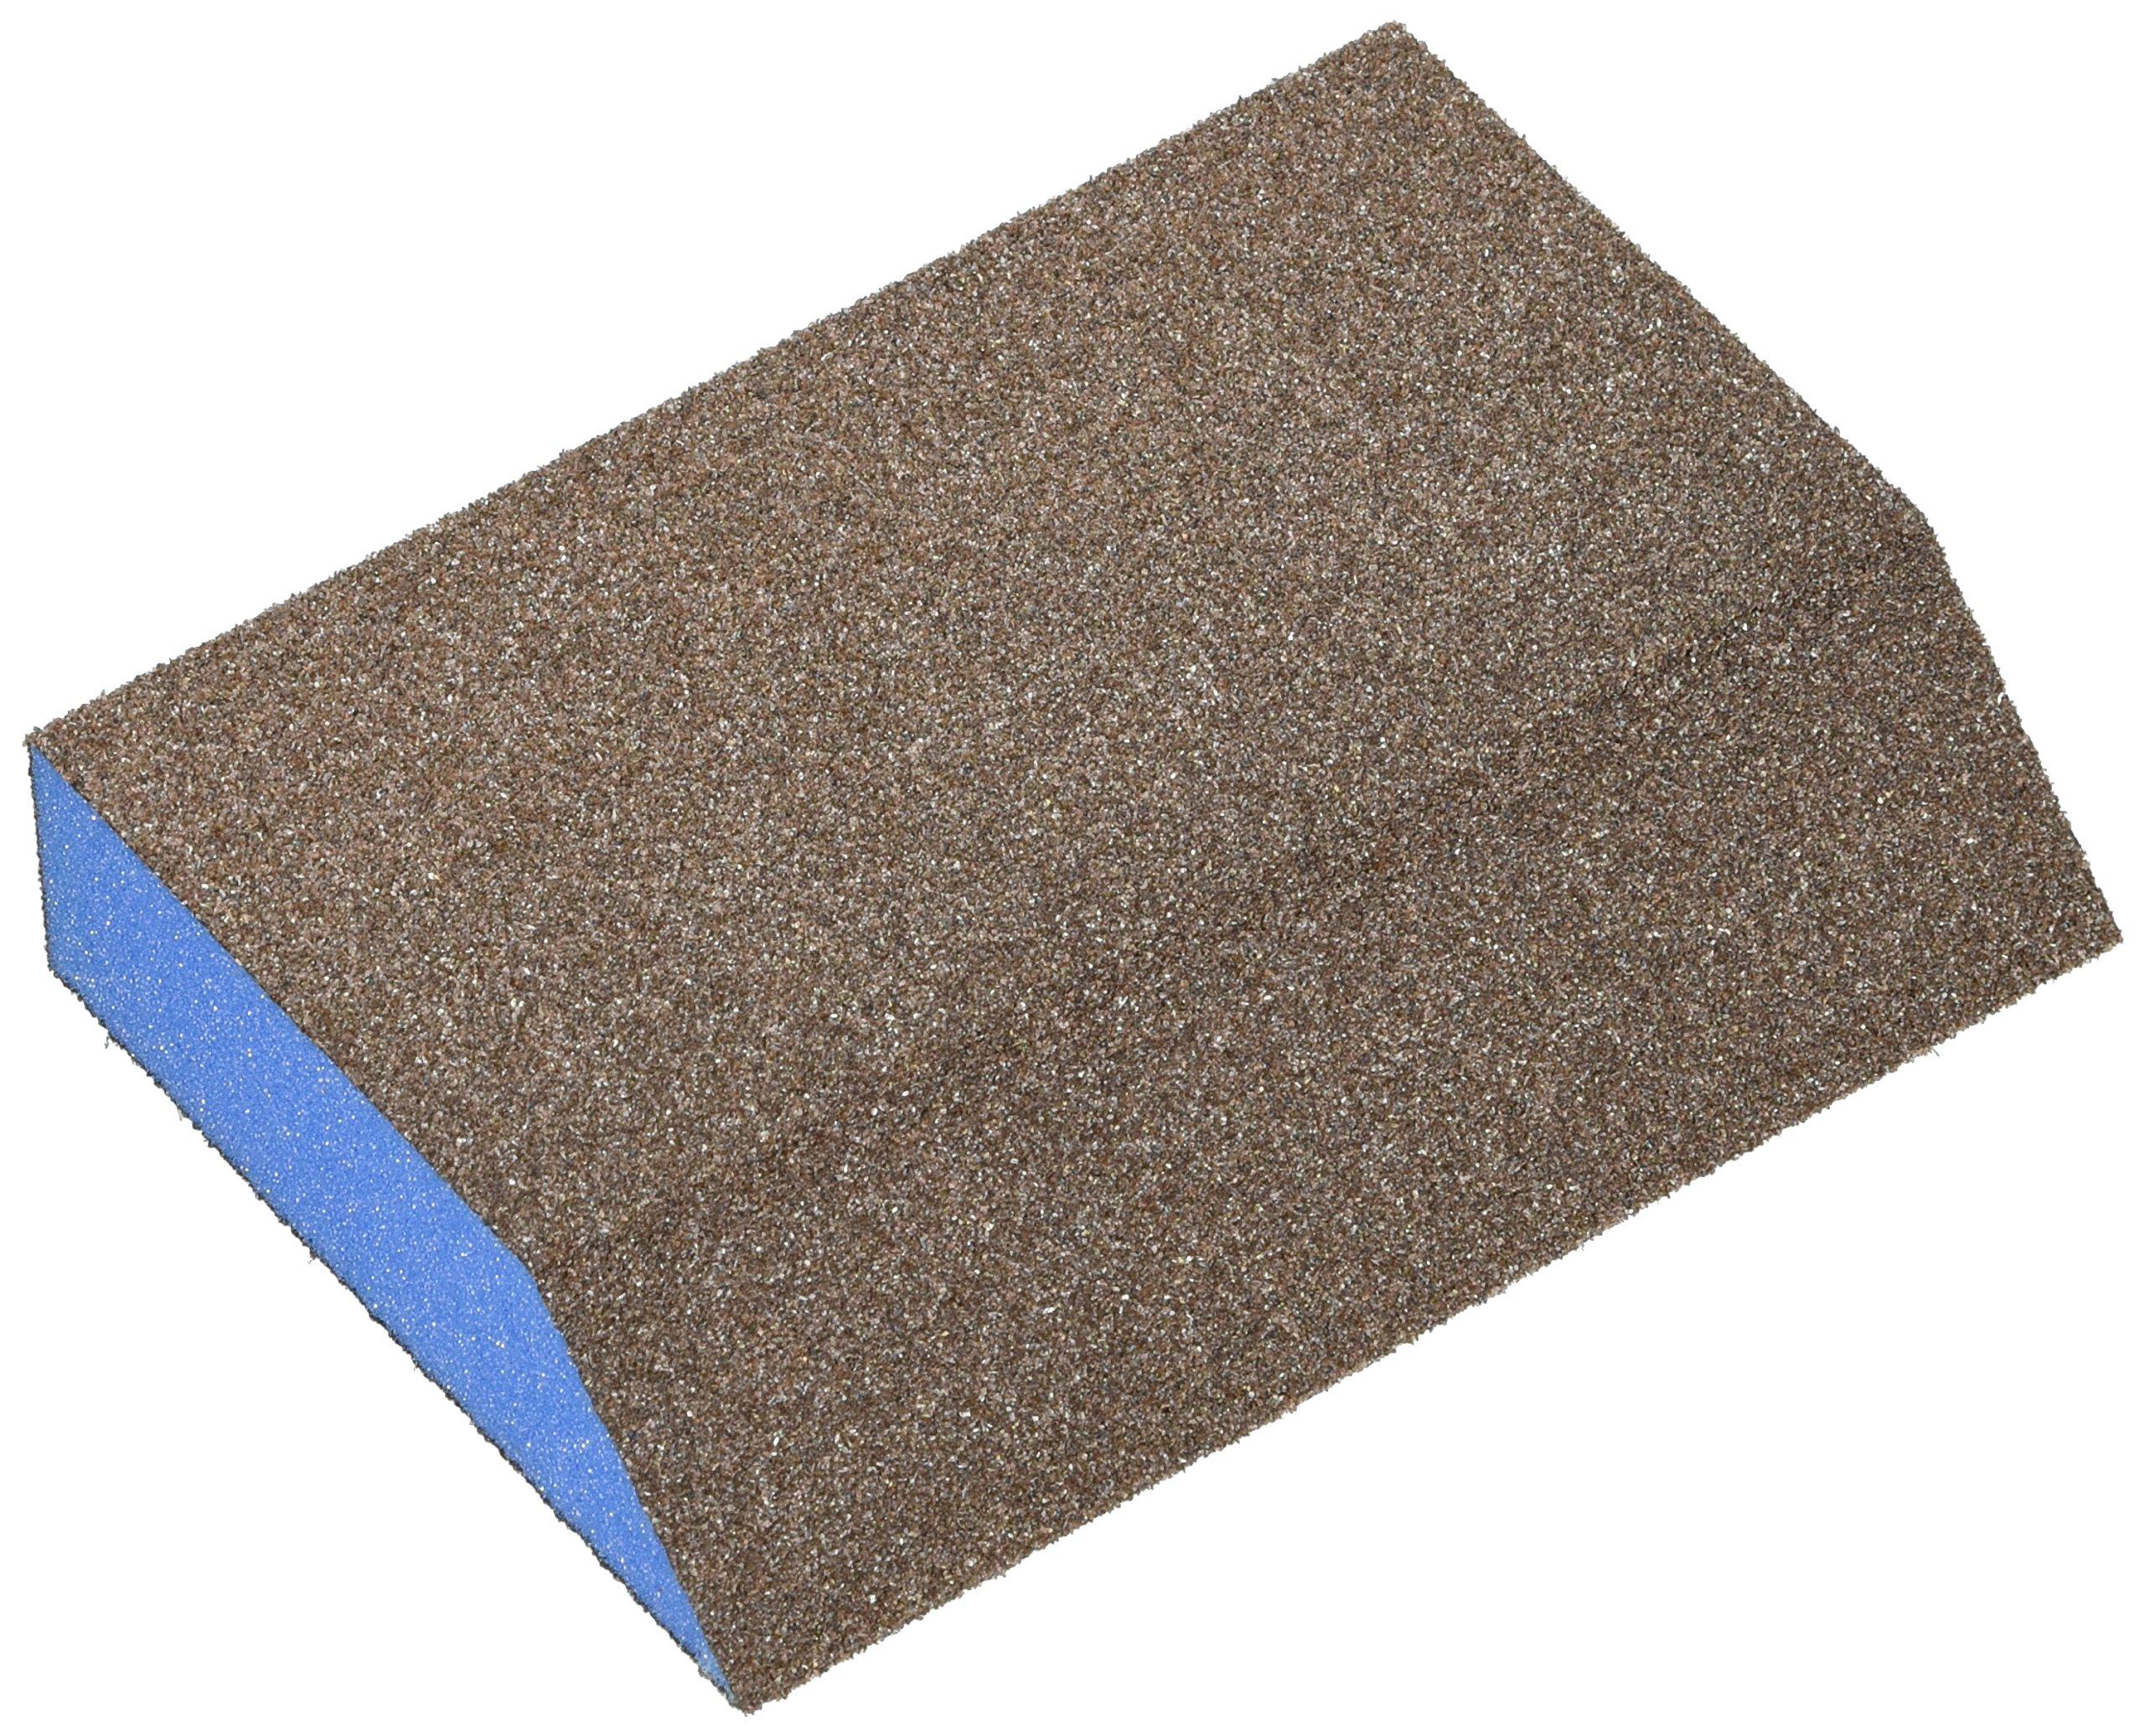 Webb Abrasives 500027 Large Angle Block Sanding Sponges (24 Pack), Medium Grit, 3'' x 5'' x 1''